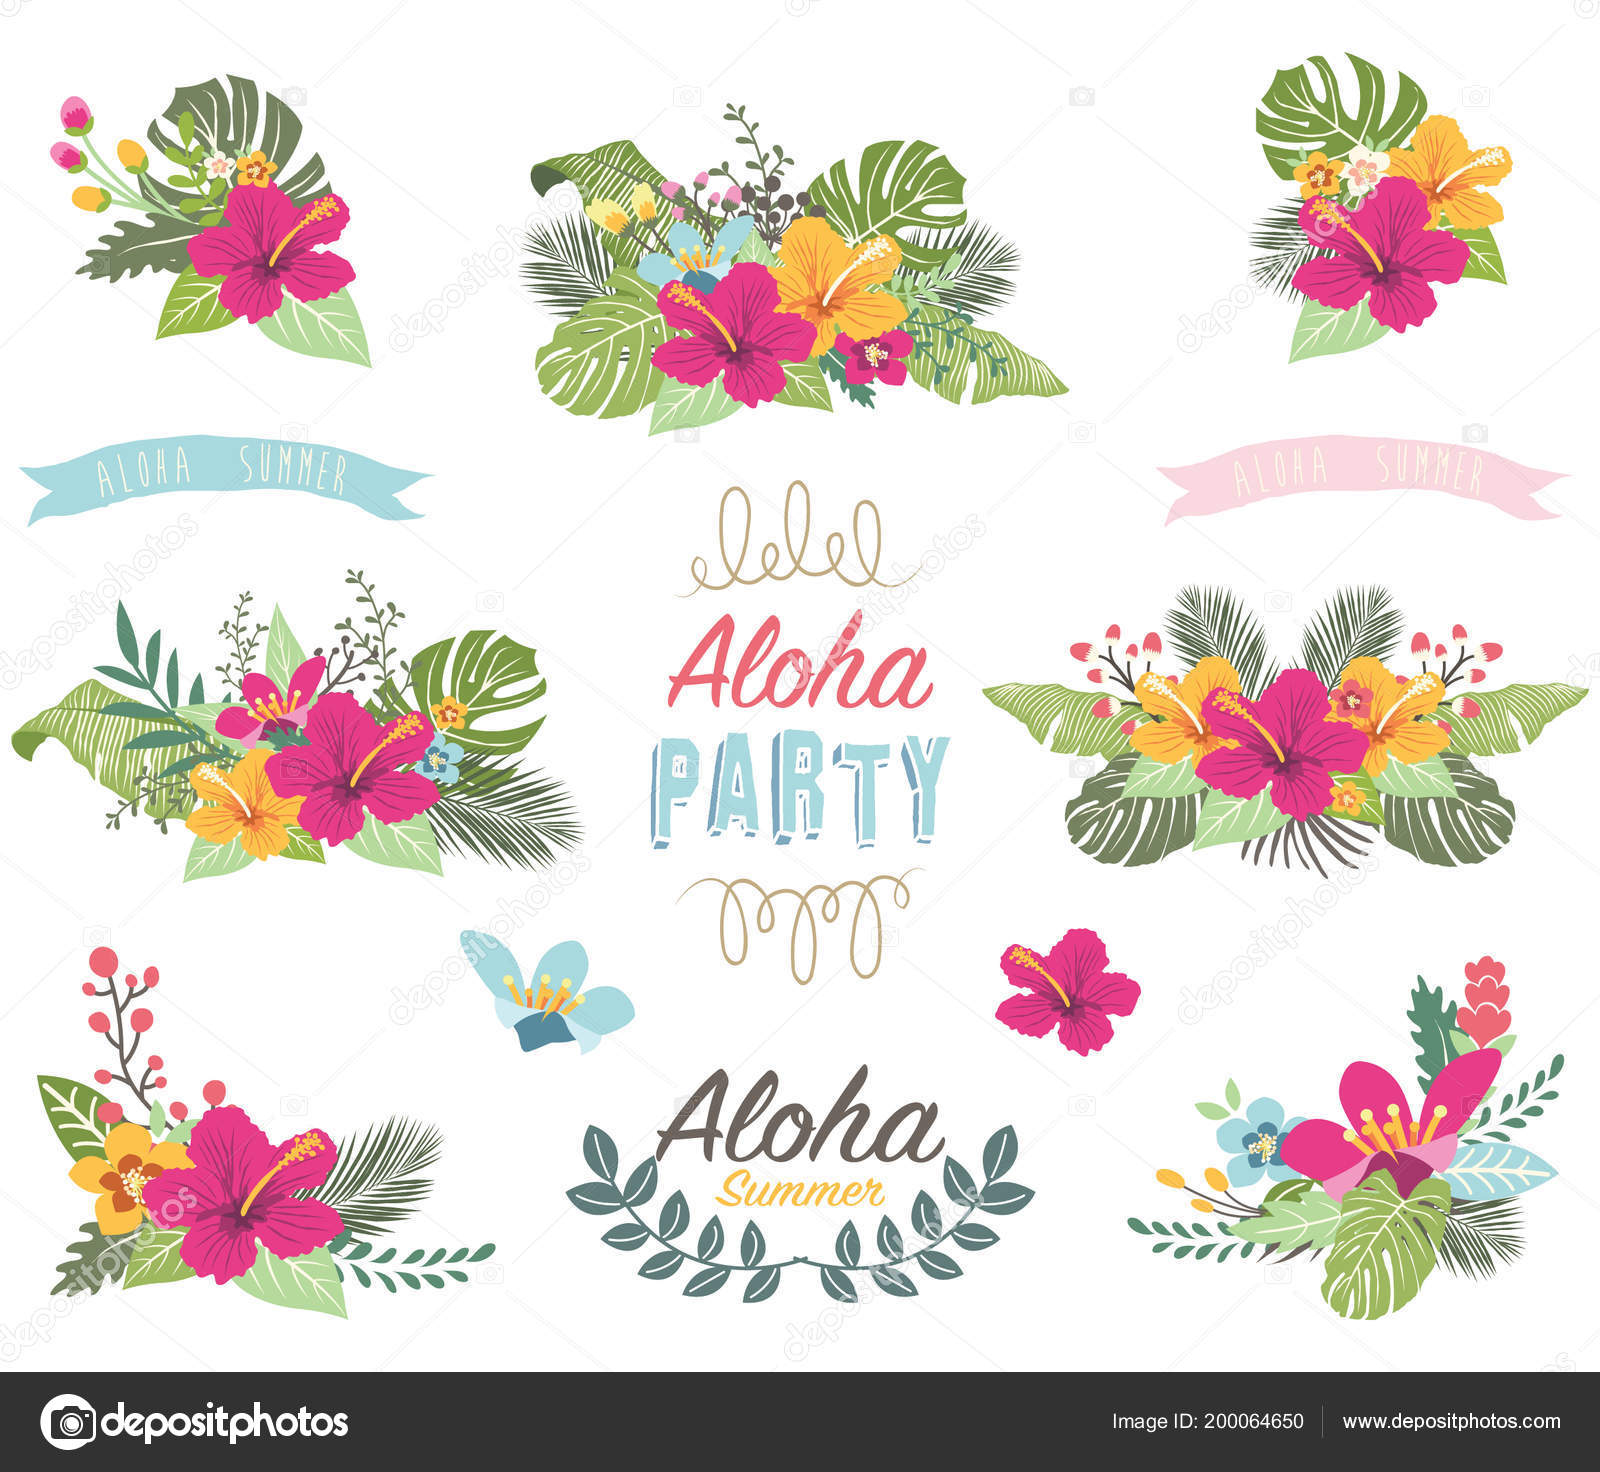 Tropicana Sommer Blumen Elemente Vektor Illustration Der Tropicana